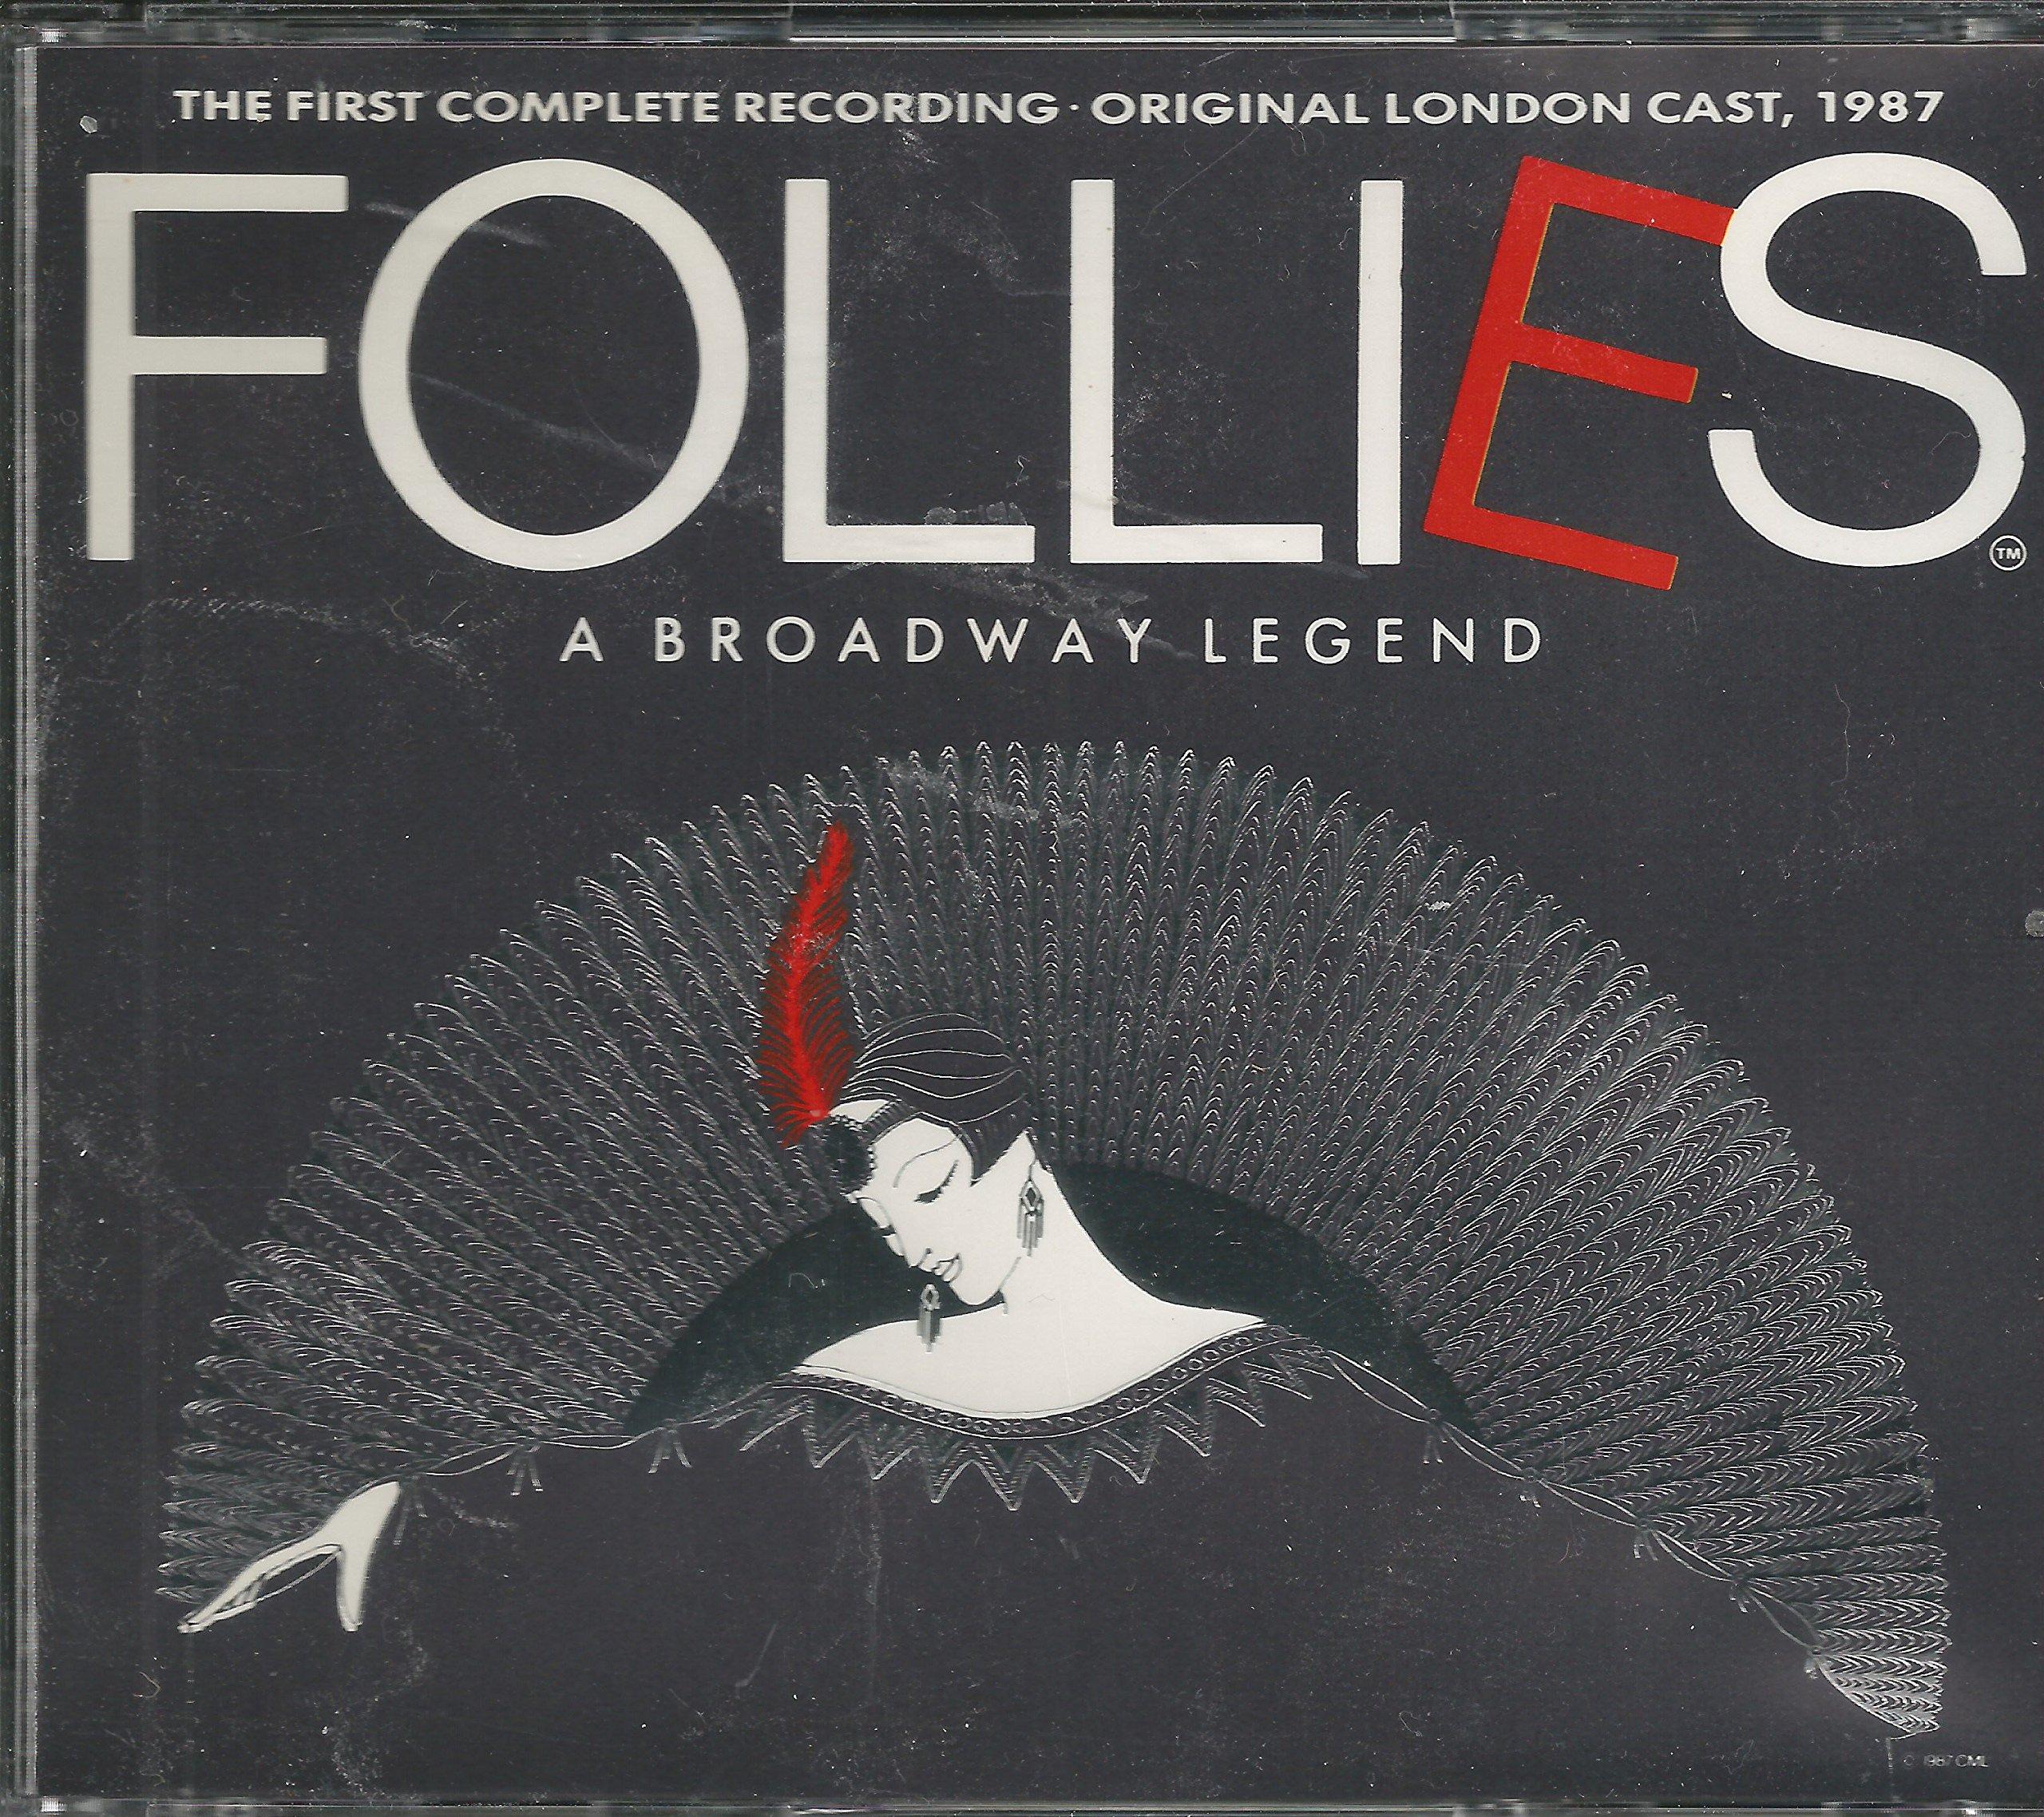 Follies: A Broadway Legend (The First Complete Recording, Original London Cast, 1987)